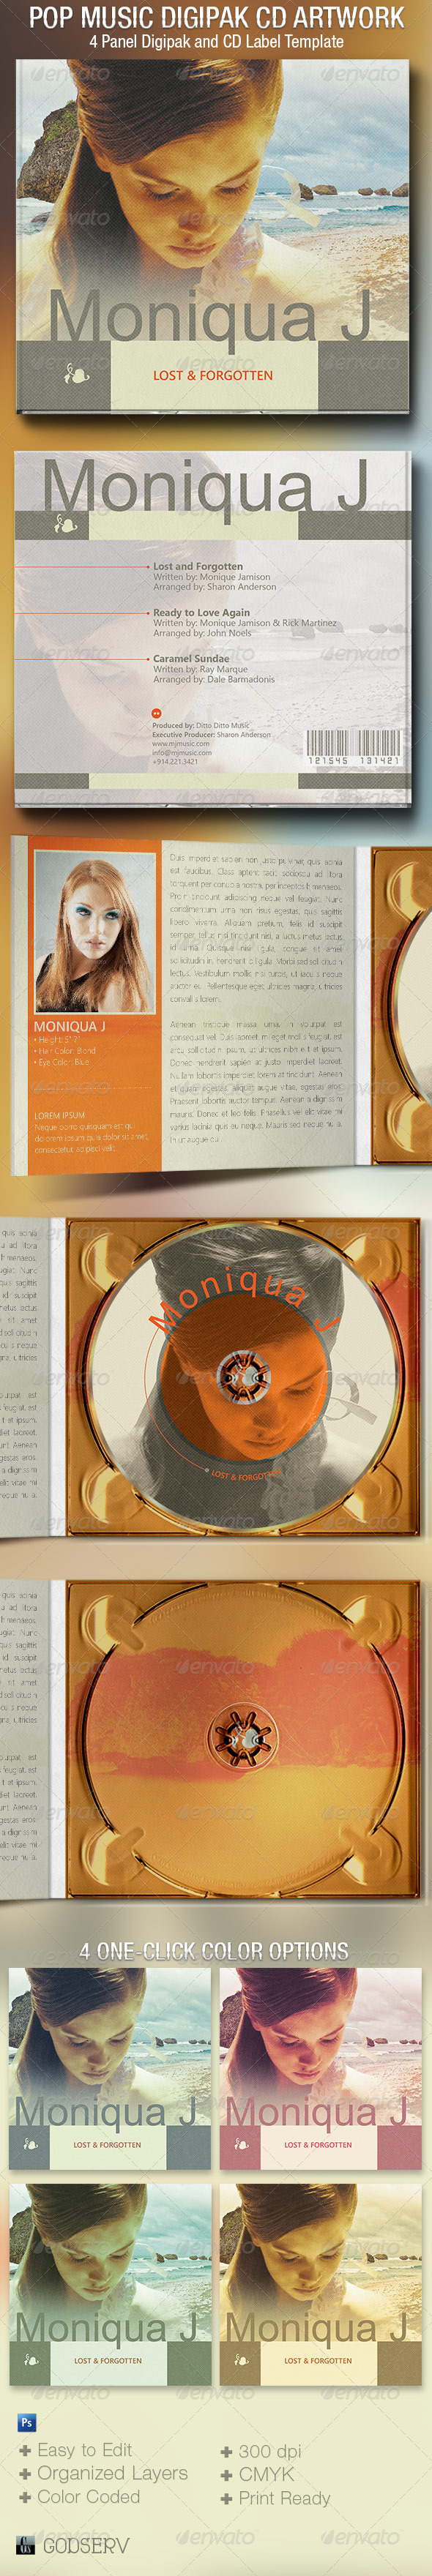 GraphicRiver Pop Music 4 Panel Digipak CD Artwork Template 6426189